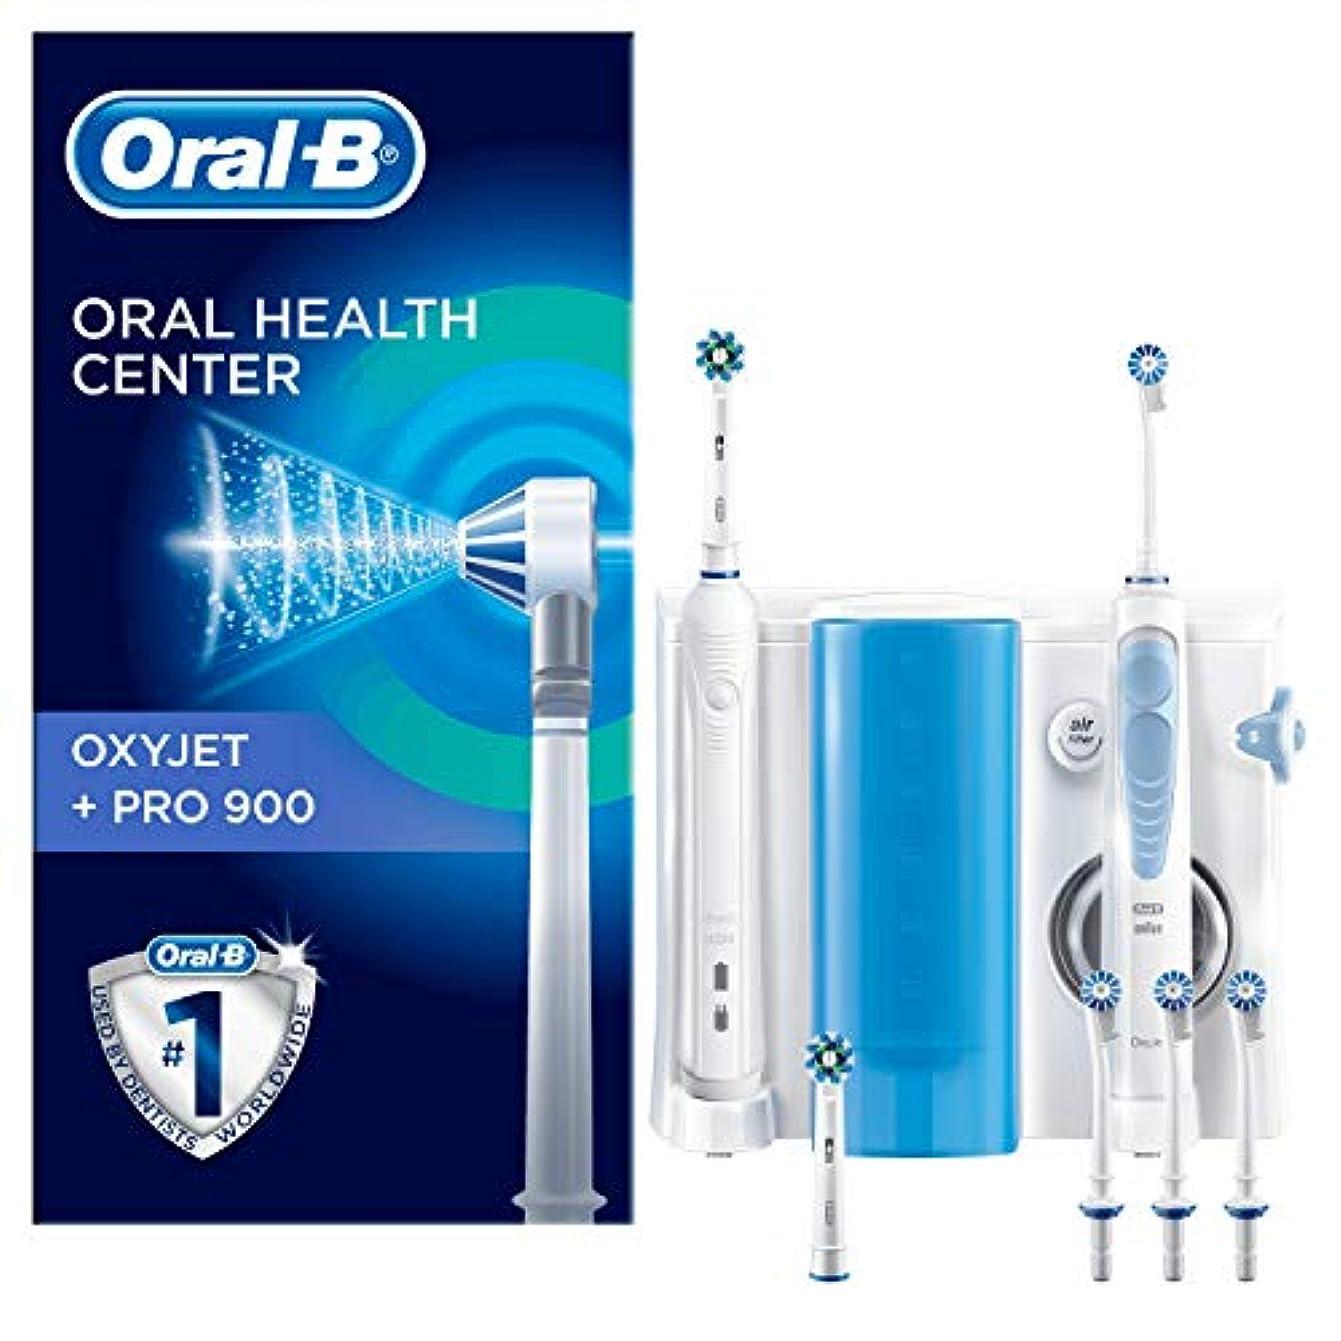 反論者絶対に失業者Oral B Dental Center Oxyjet Irrigator + Electric Brush Pro 900 [並行輸入品]